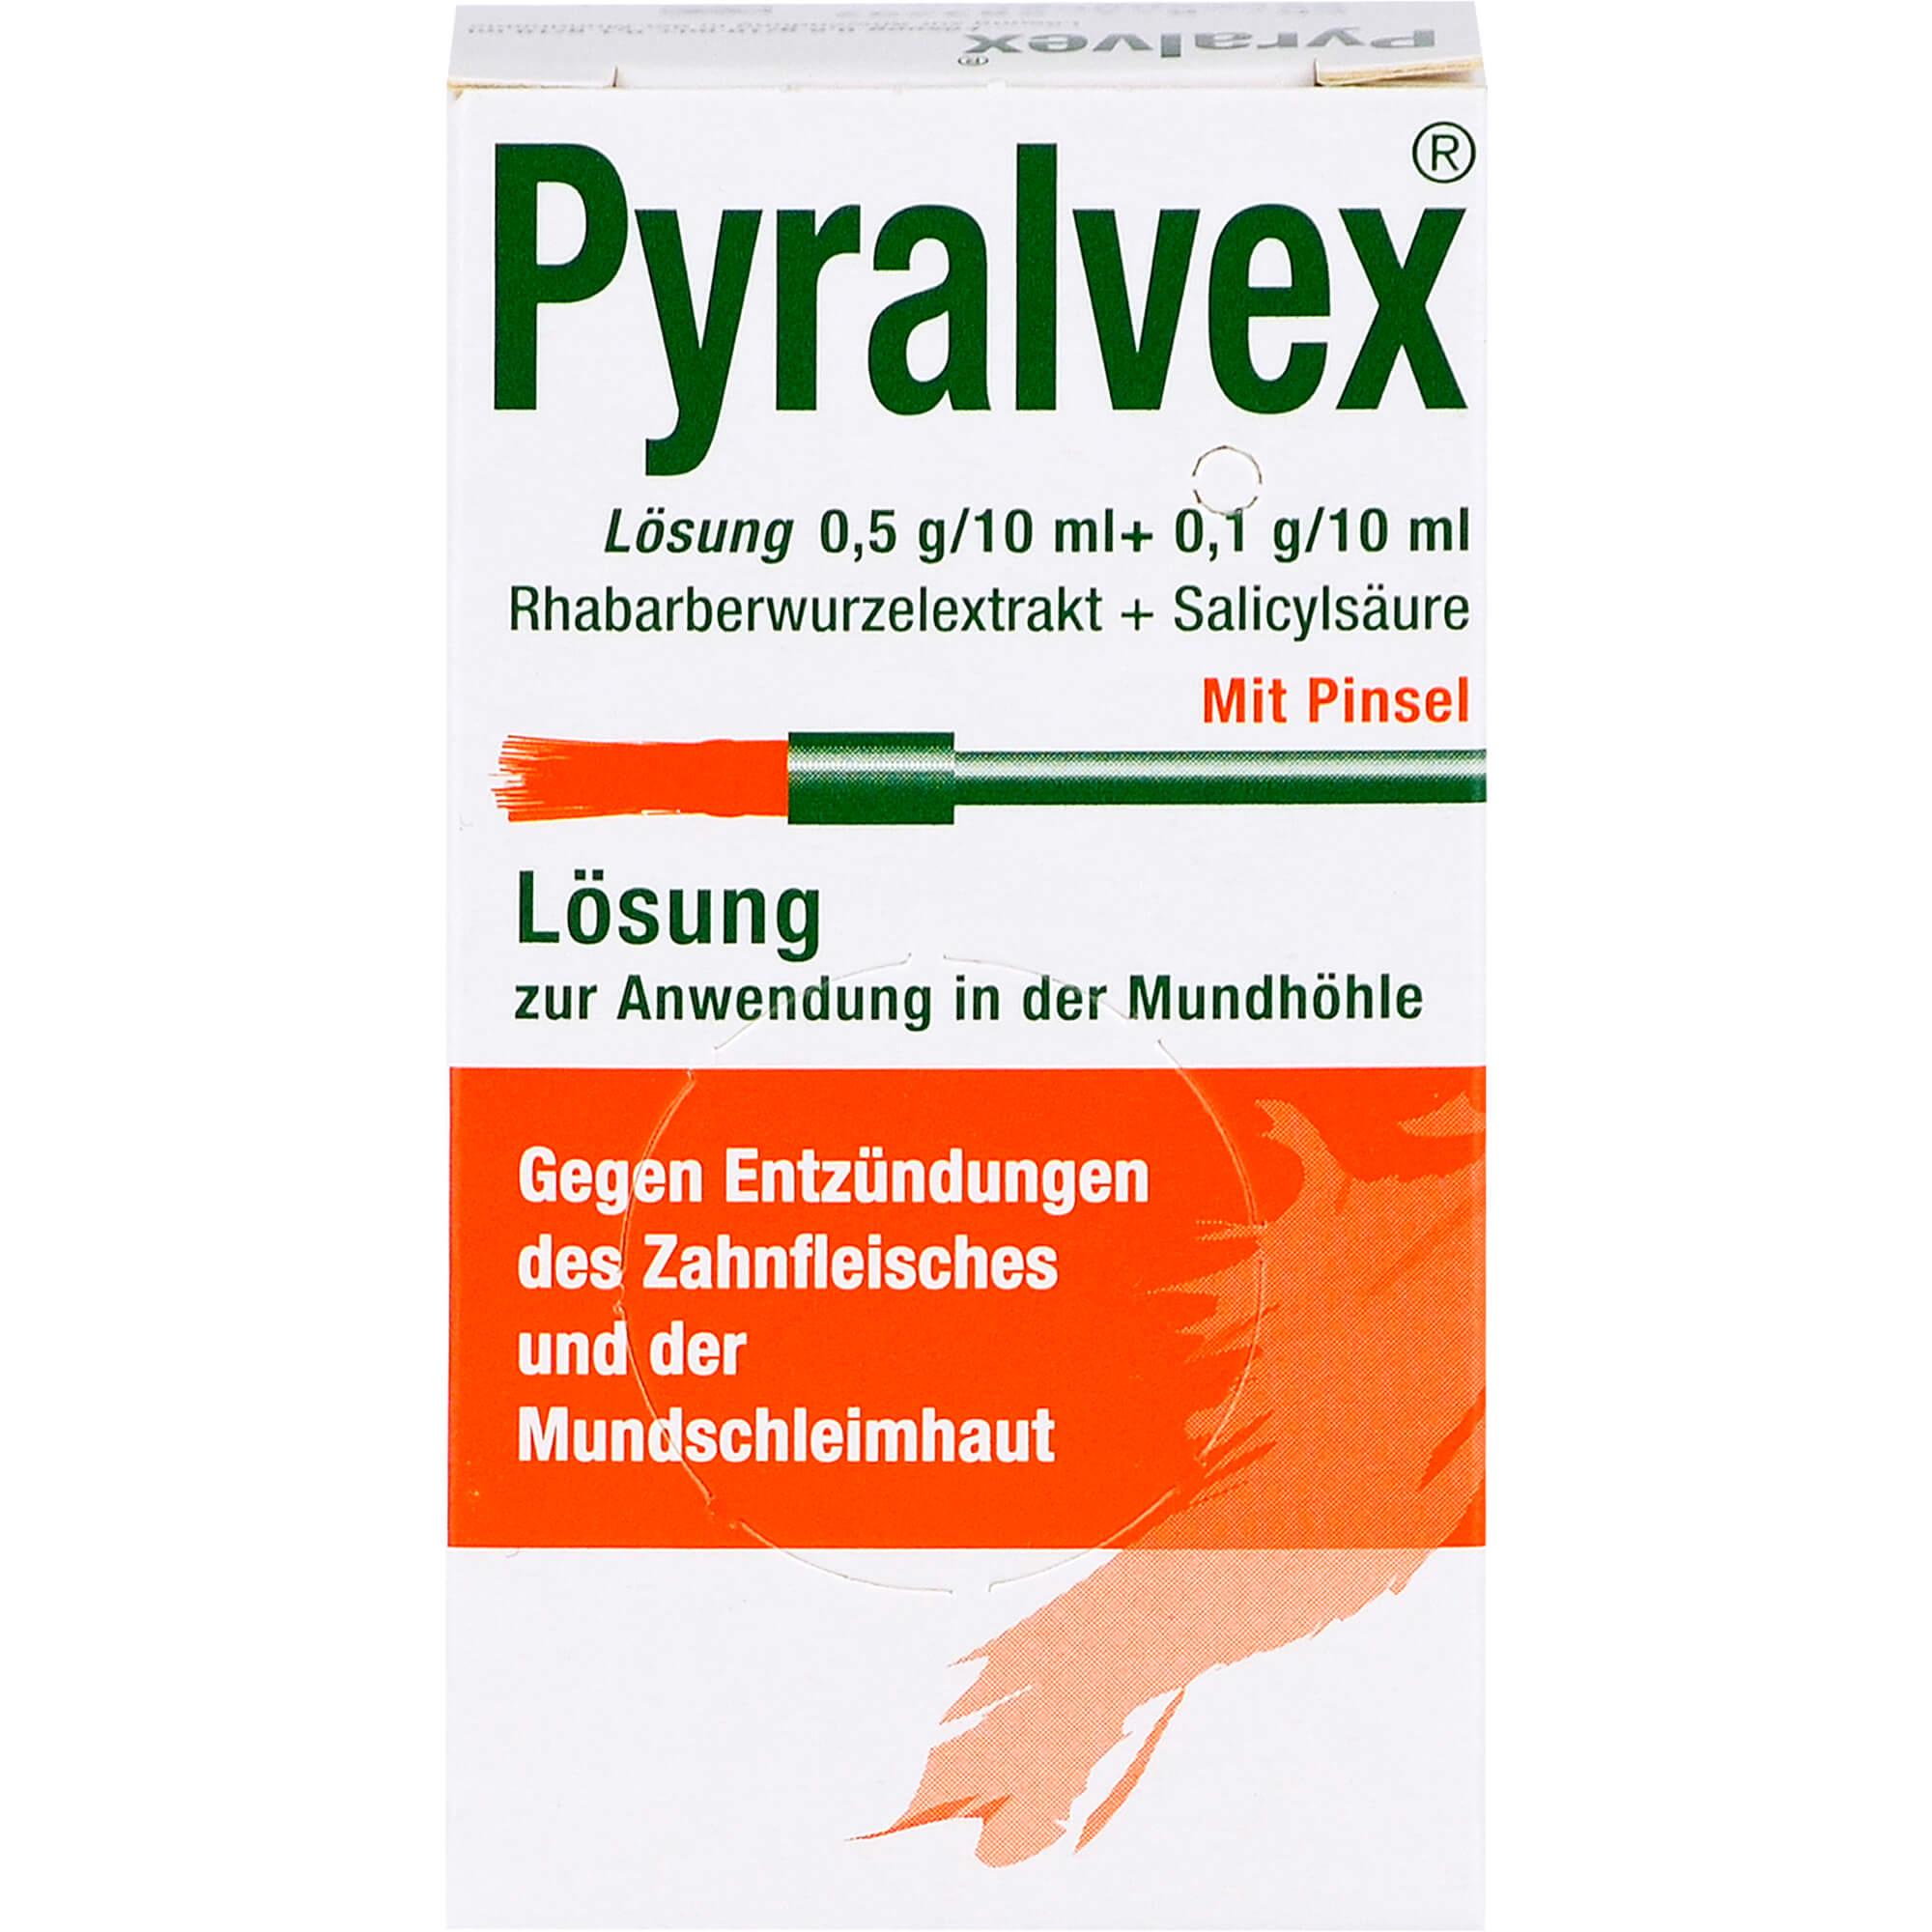 PYRALVEX-Loesung